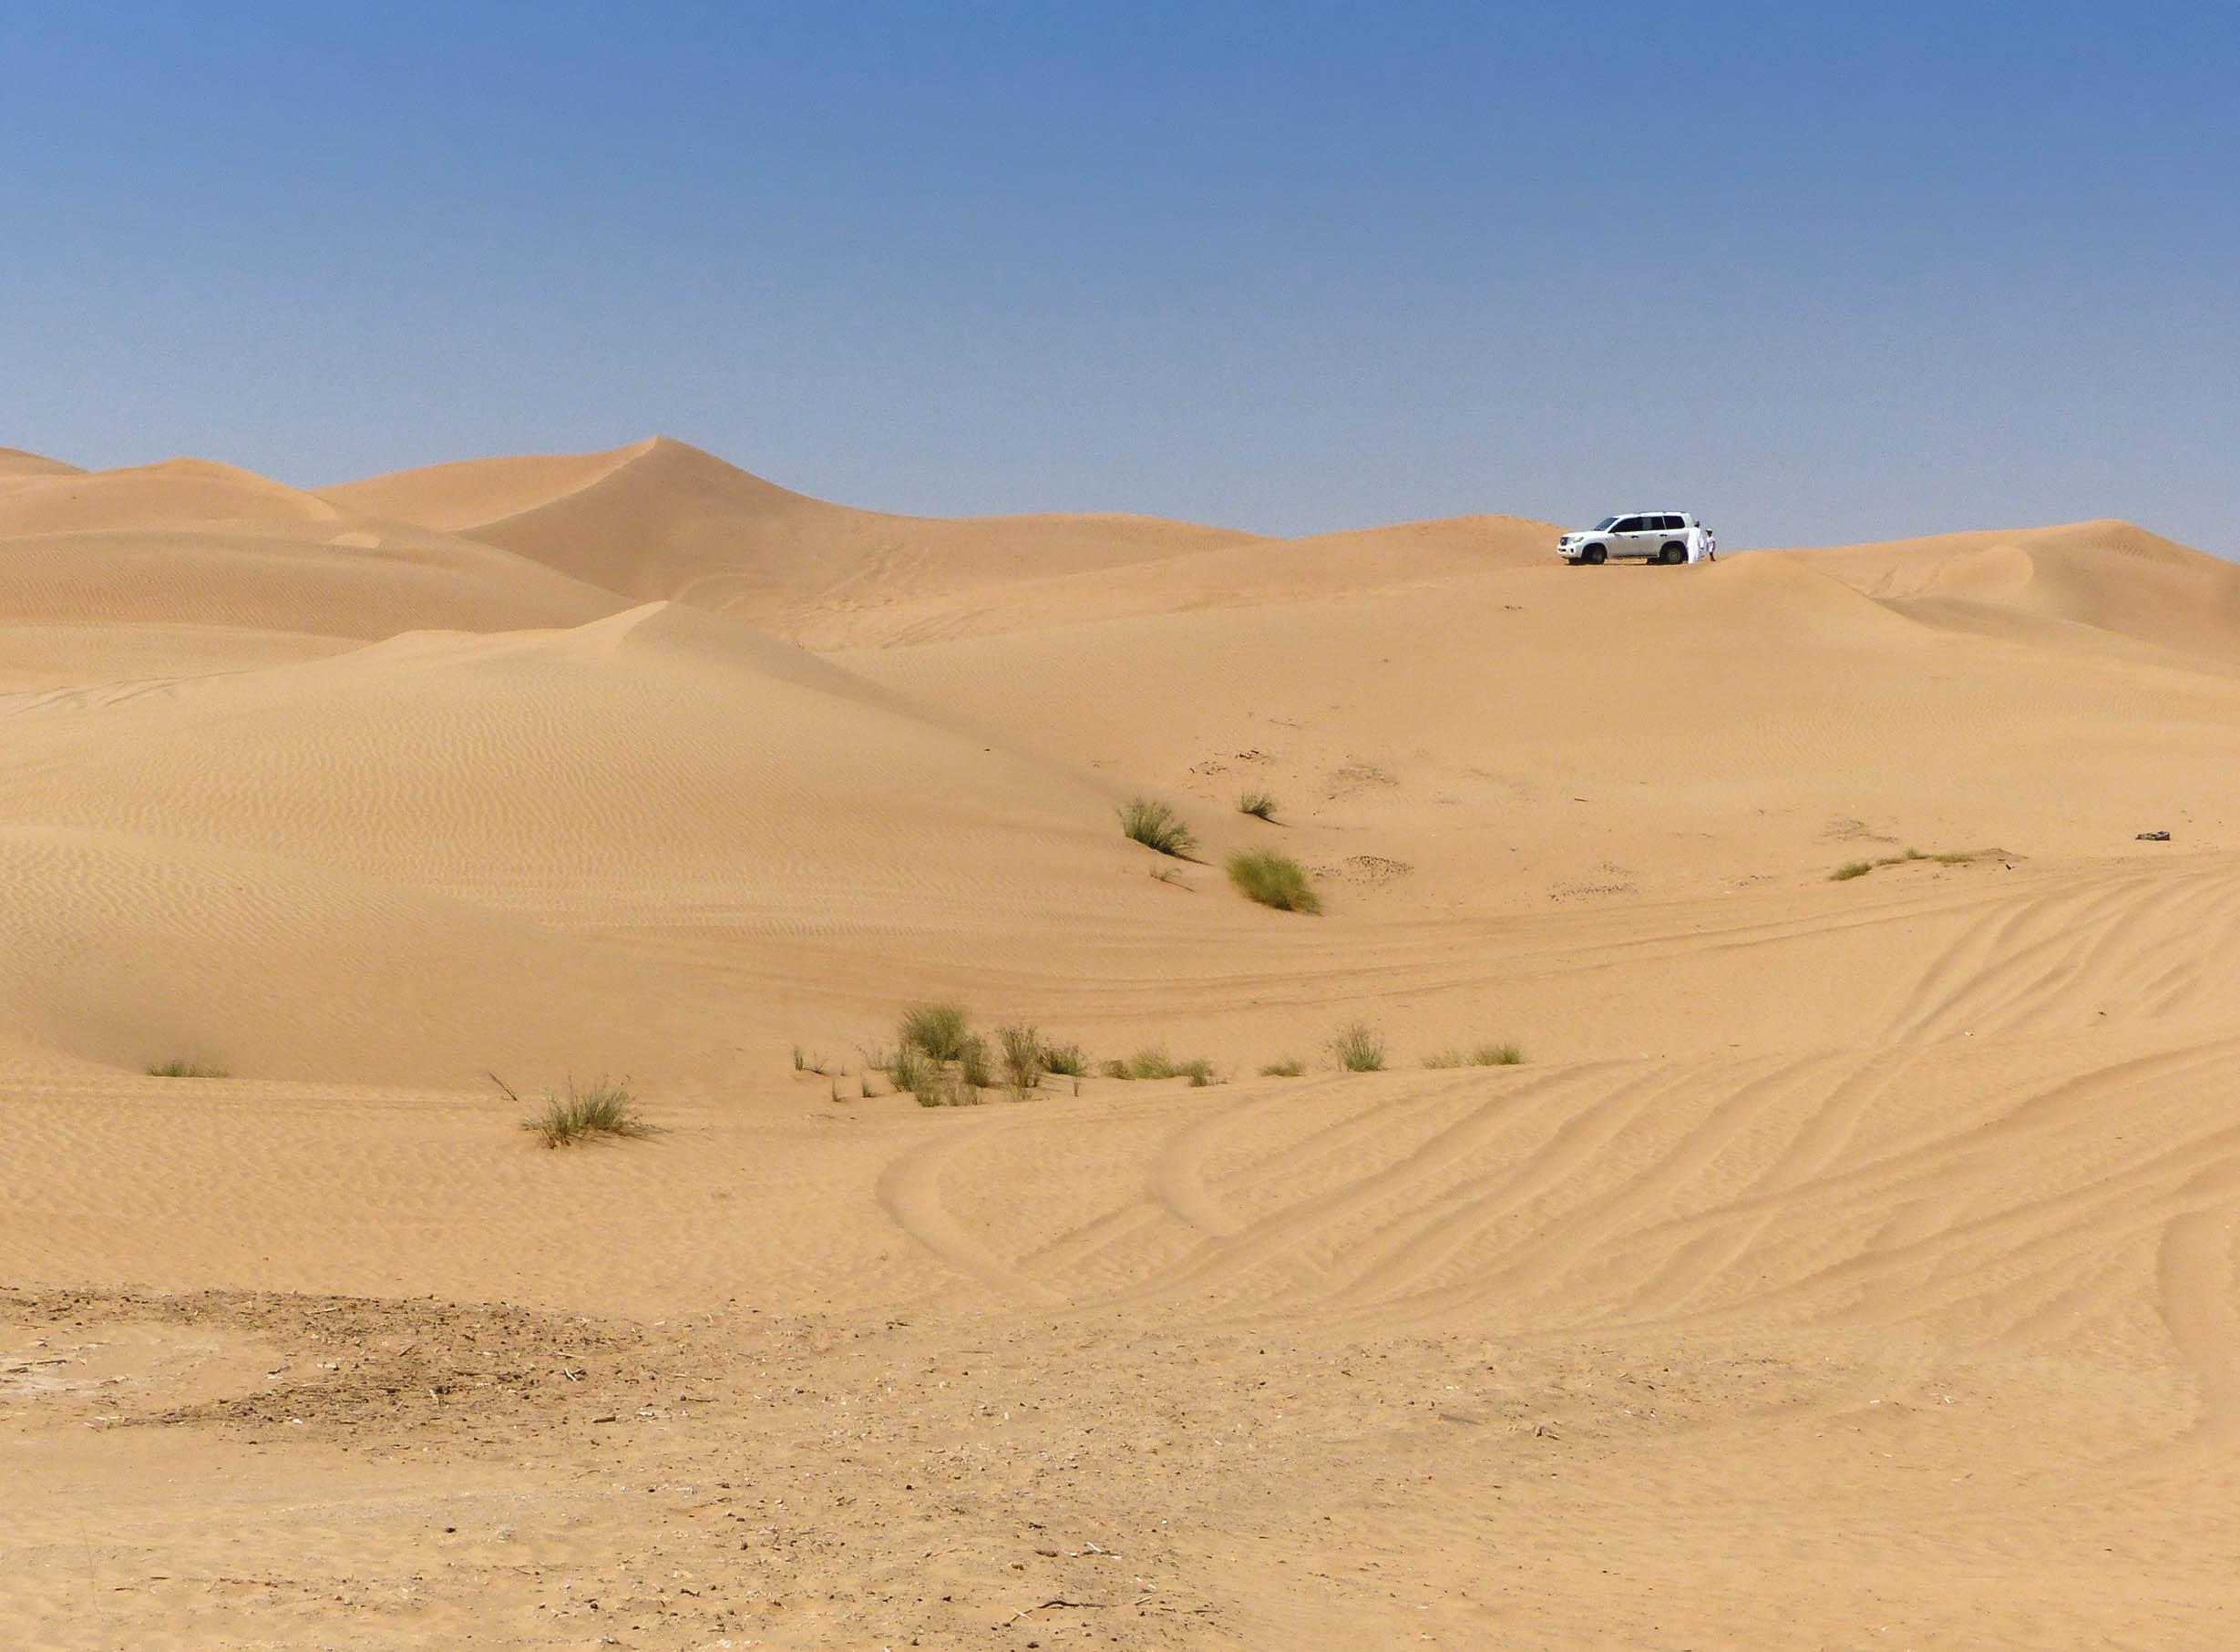 White car on ridge of sand dunes